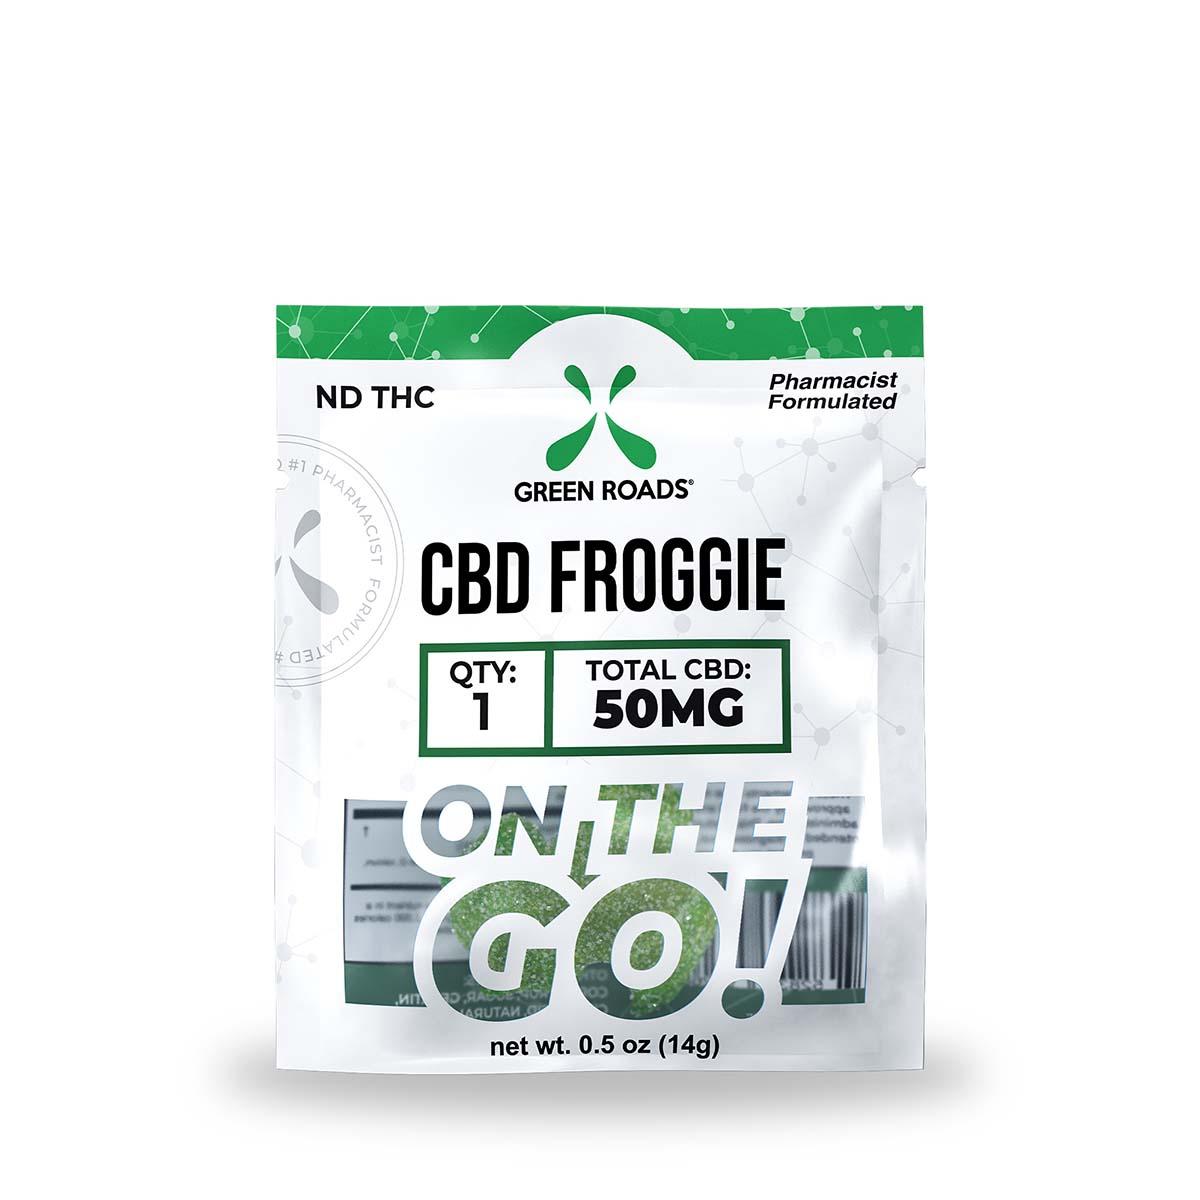 CBD Froggie – 50 MG Green Roads CBD